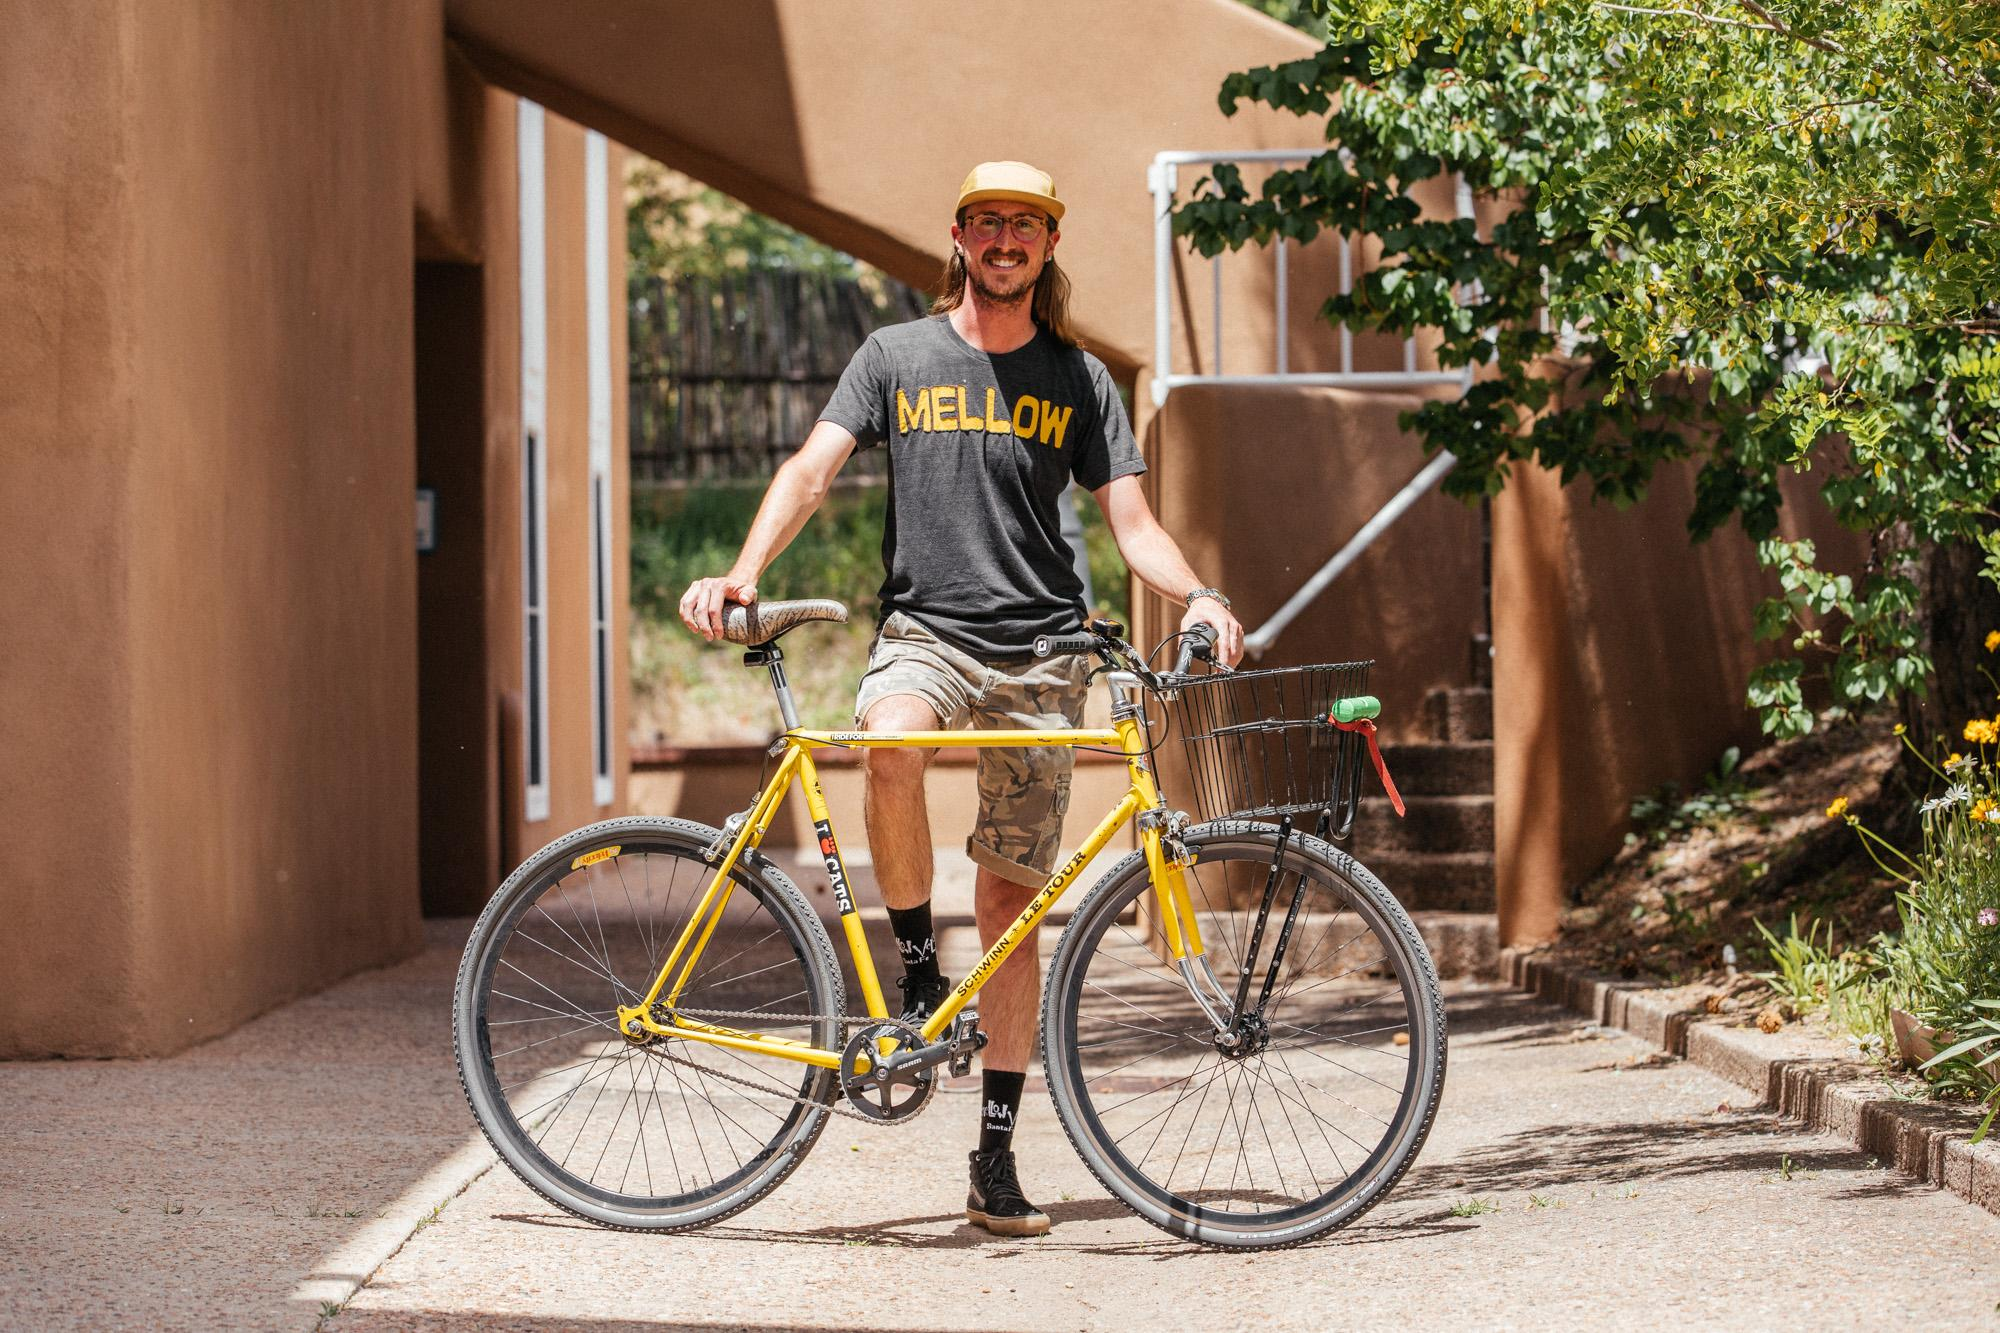 Nice seein ya, Rawson - we'll look at your bike later...